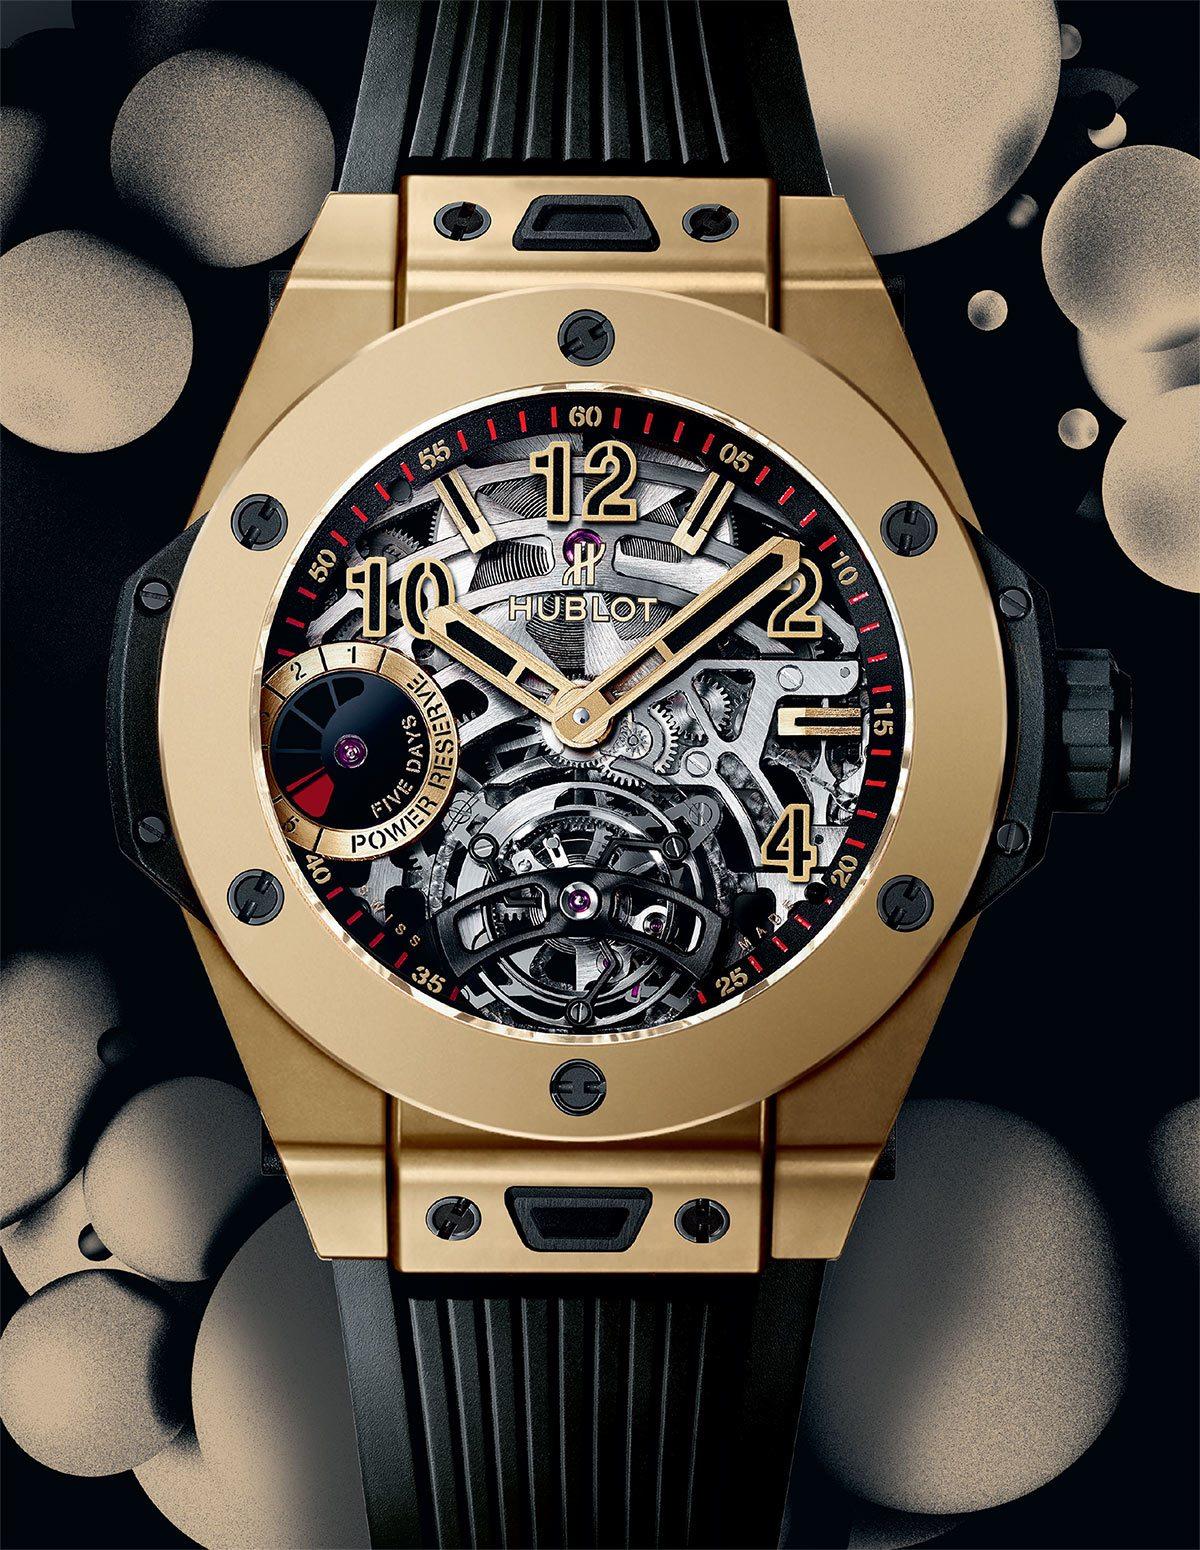 Hublot_Big_Bang_Tourbillon_5-Day_Power_Reserve_Indicator_Full_Magic_Gold_1[1]